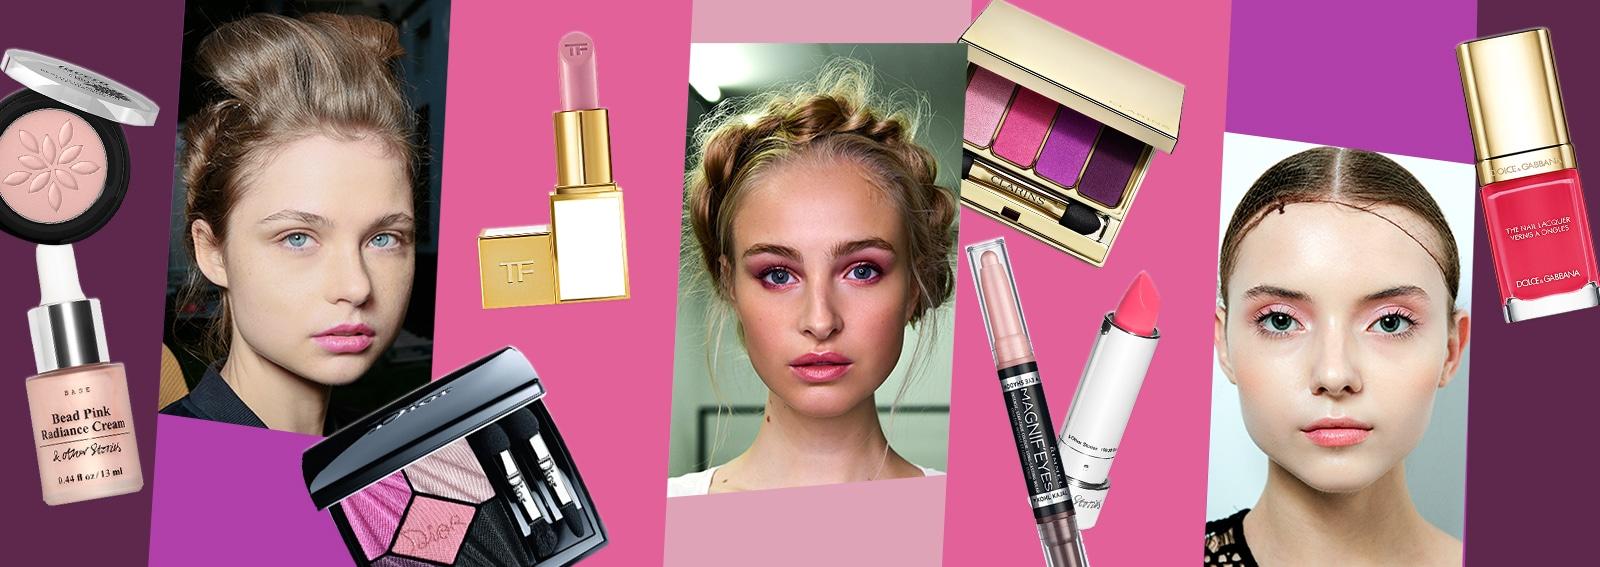 DESKTOP_makeup_rosa